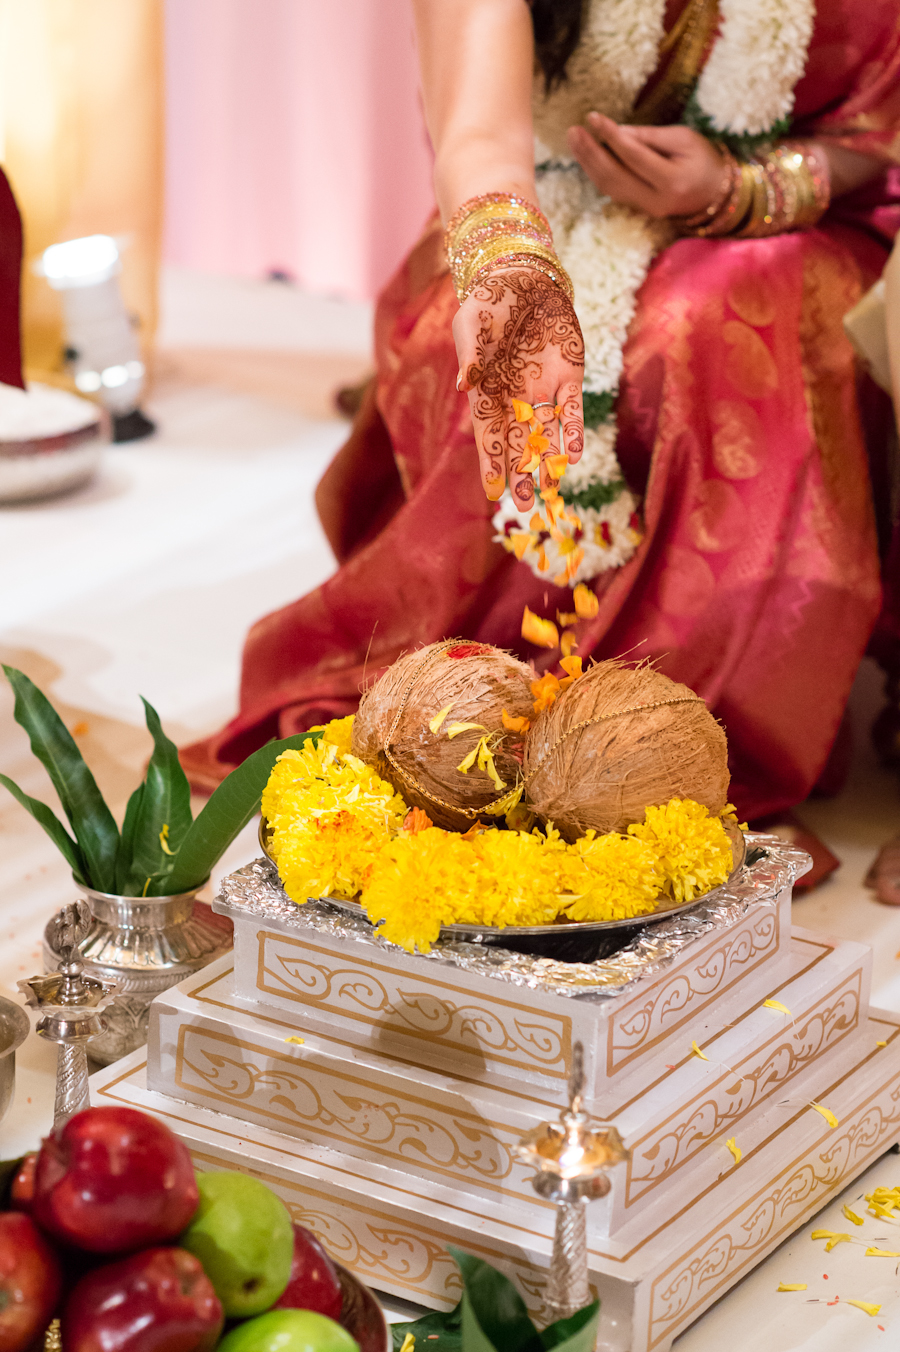 gotham hall brian hatton ang weddings and events-19.jpg